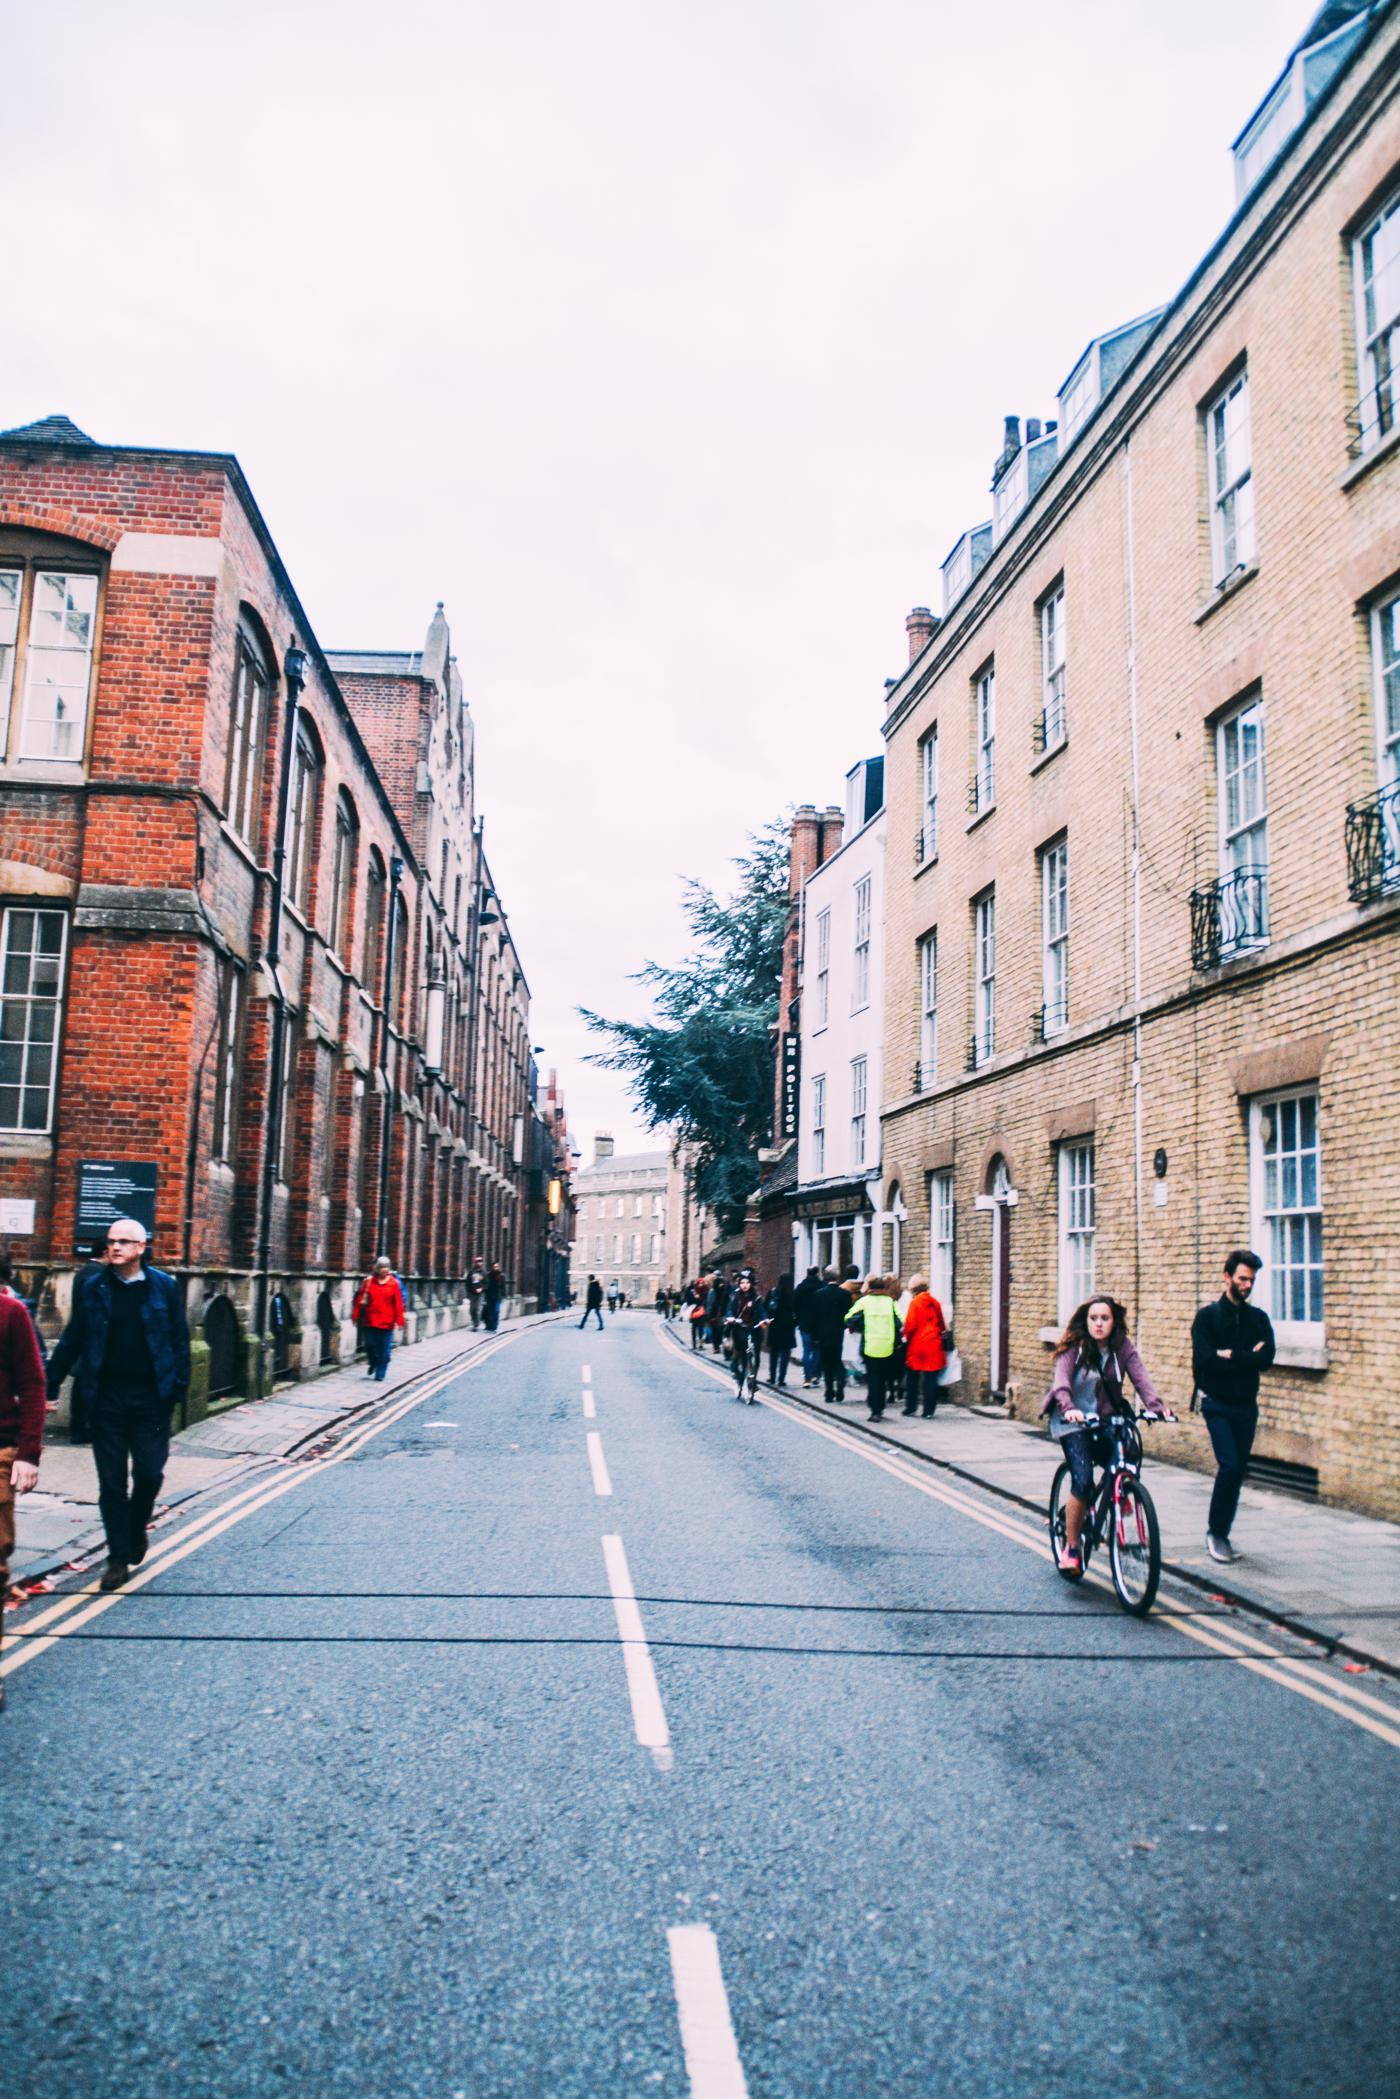 The University of Cambridge, Graduation, Senate House, Cambridge, England (4)